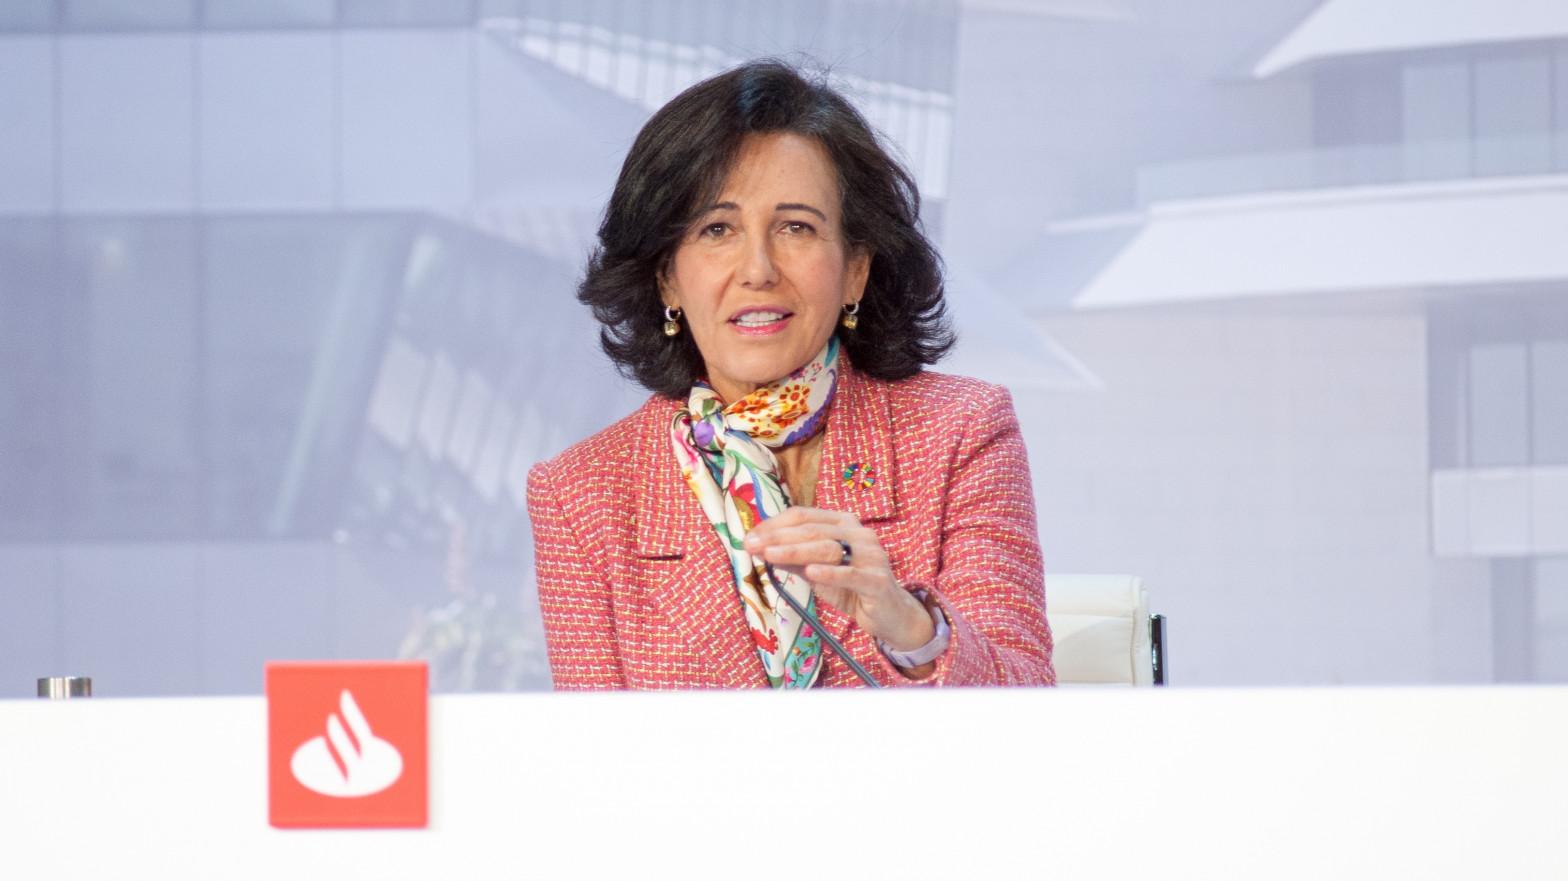 La presidenta de Banco Santander, Ana Botín,